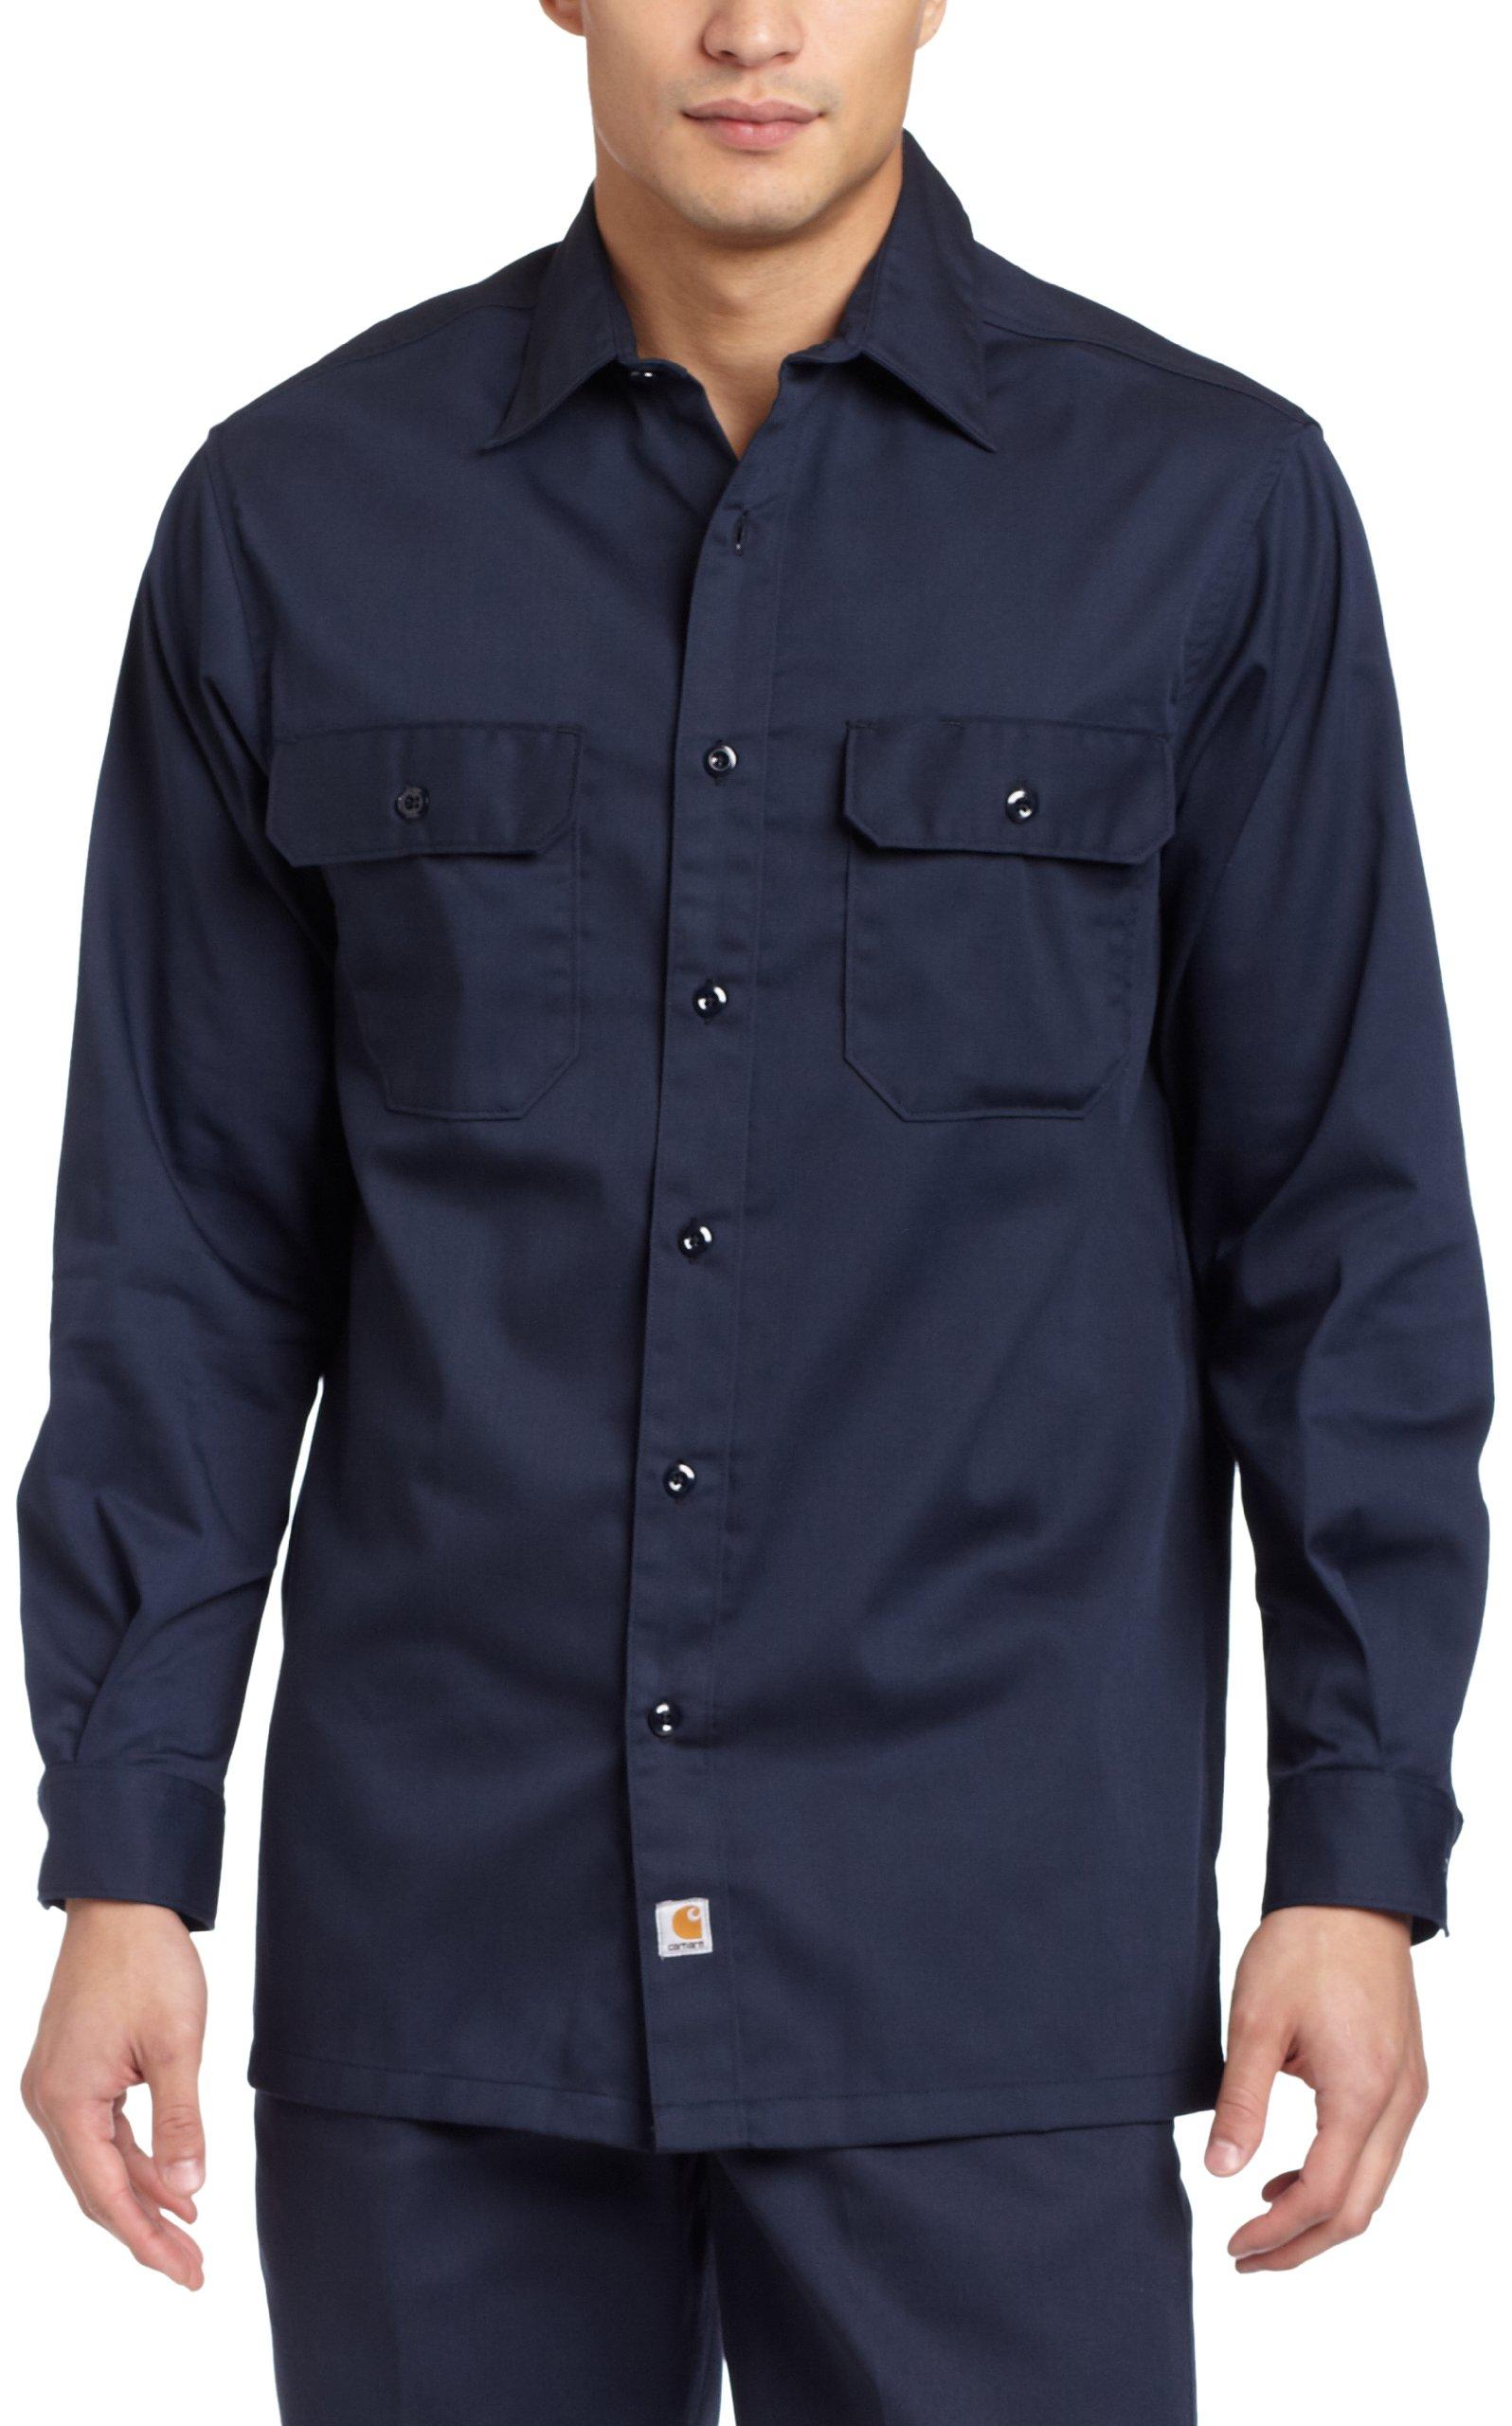 Carhartt Men's Big & Tall Twill Long Sleeve Relaxed Fit Work Shirt Button Front,Navy,XXX-Large Tall